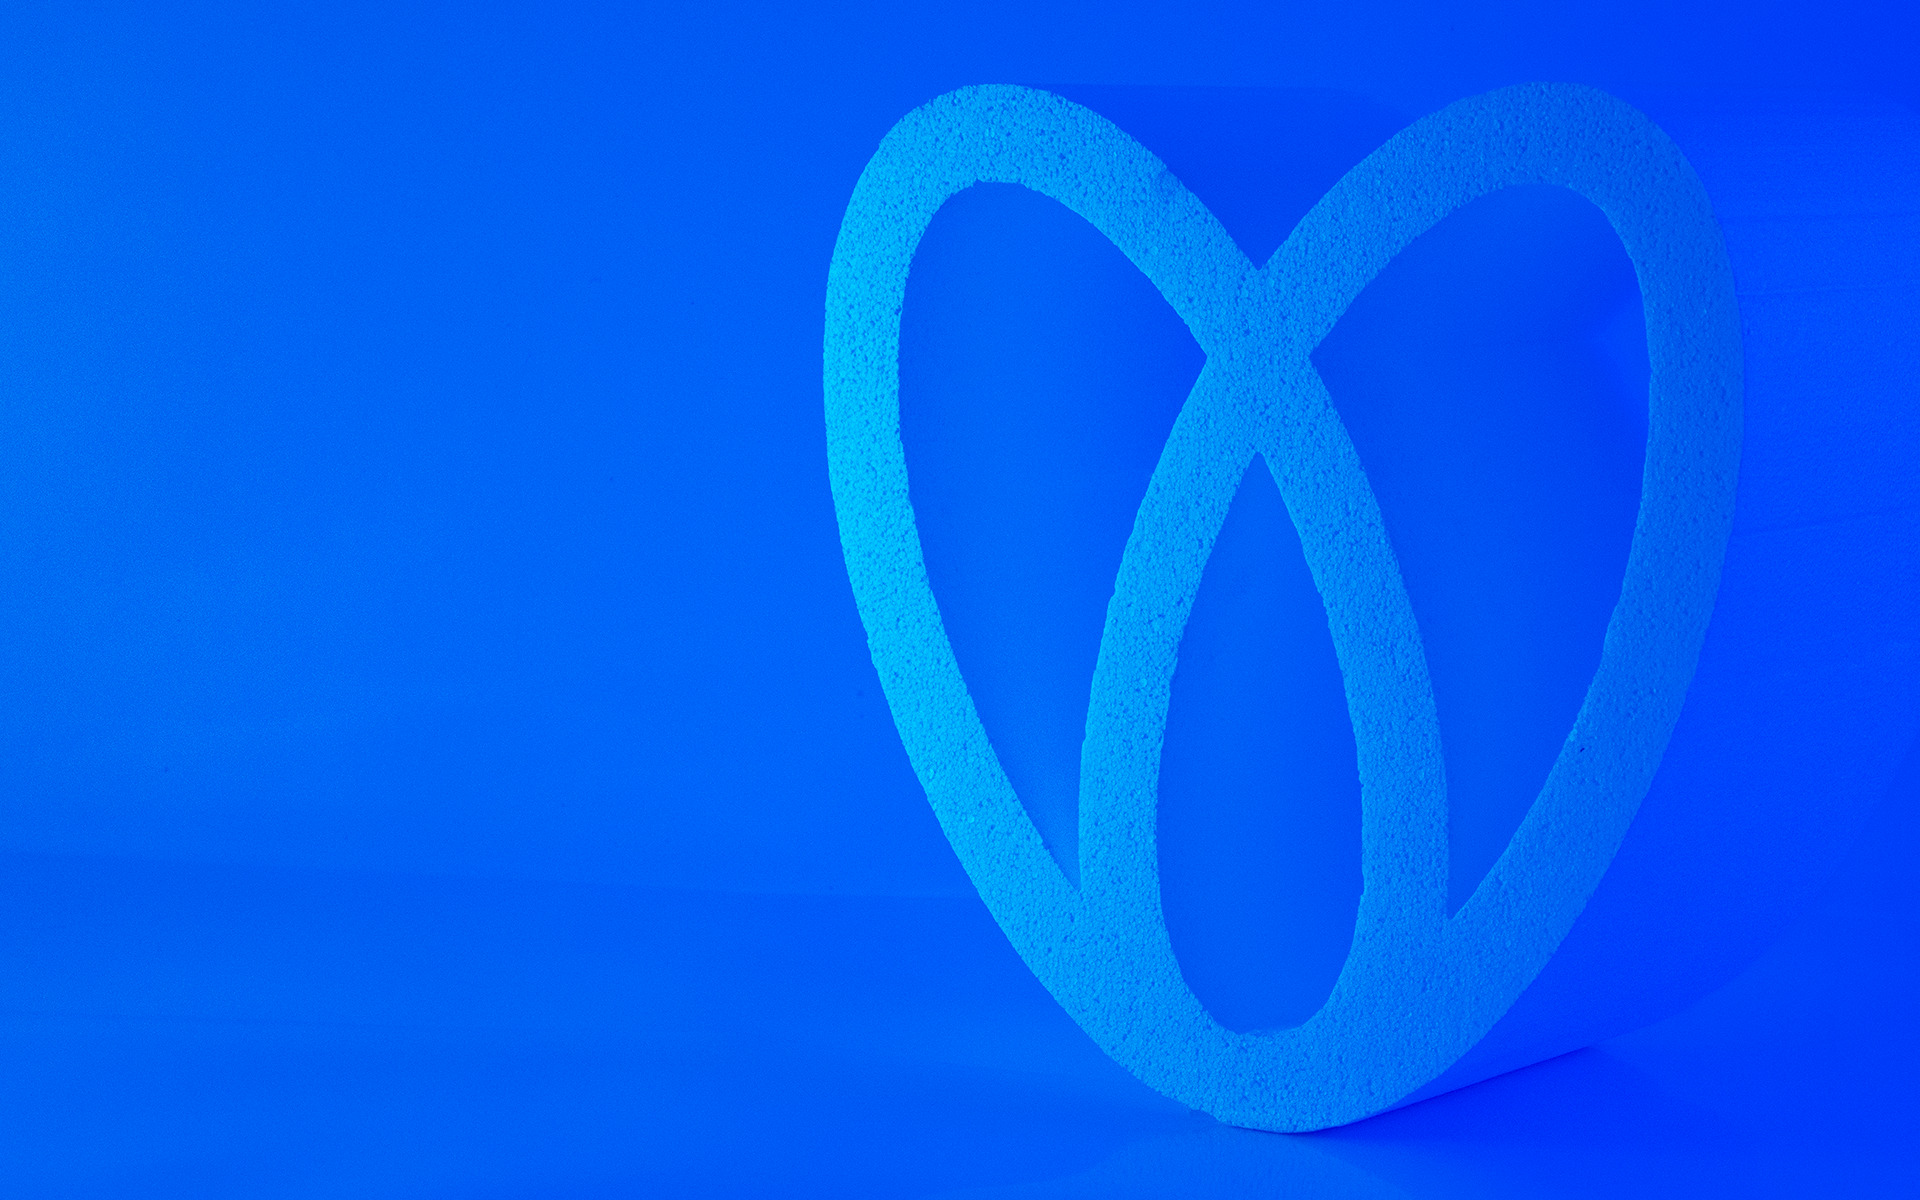 Prohealth Rebranding – A Fresh Image